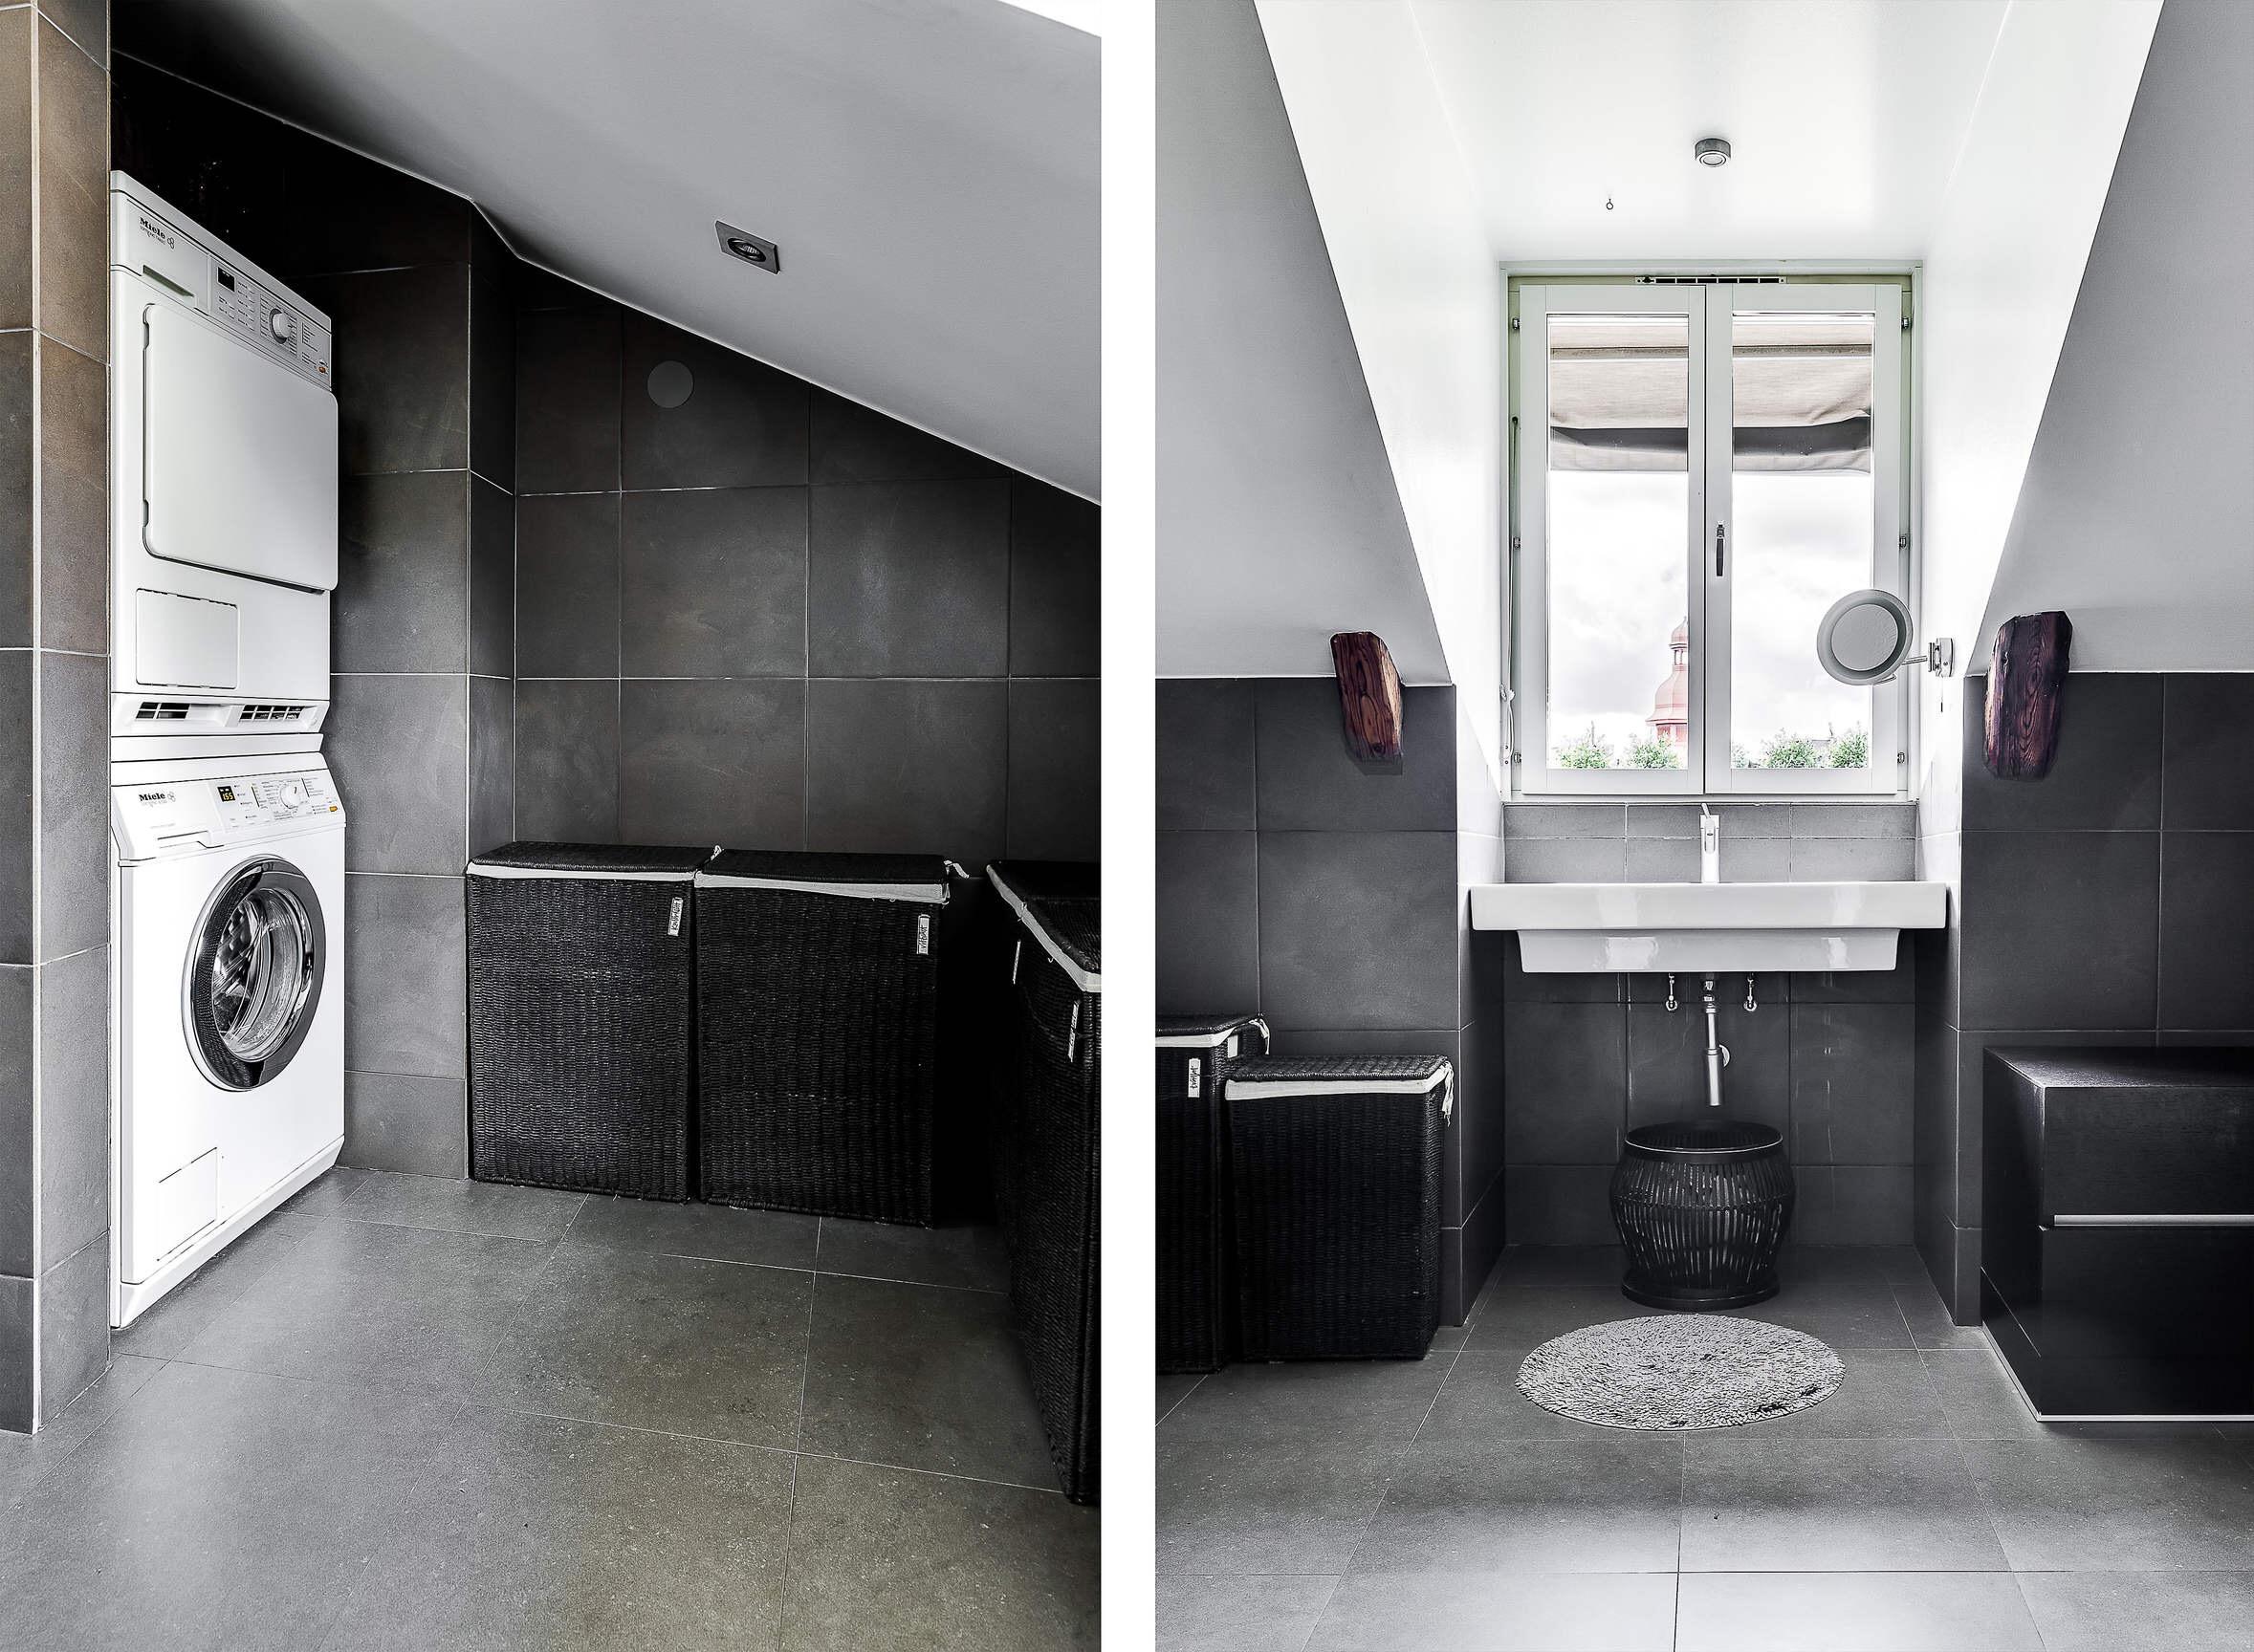 ванная комната окно раковина корзины стиральная сушильная машина